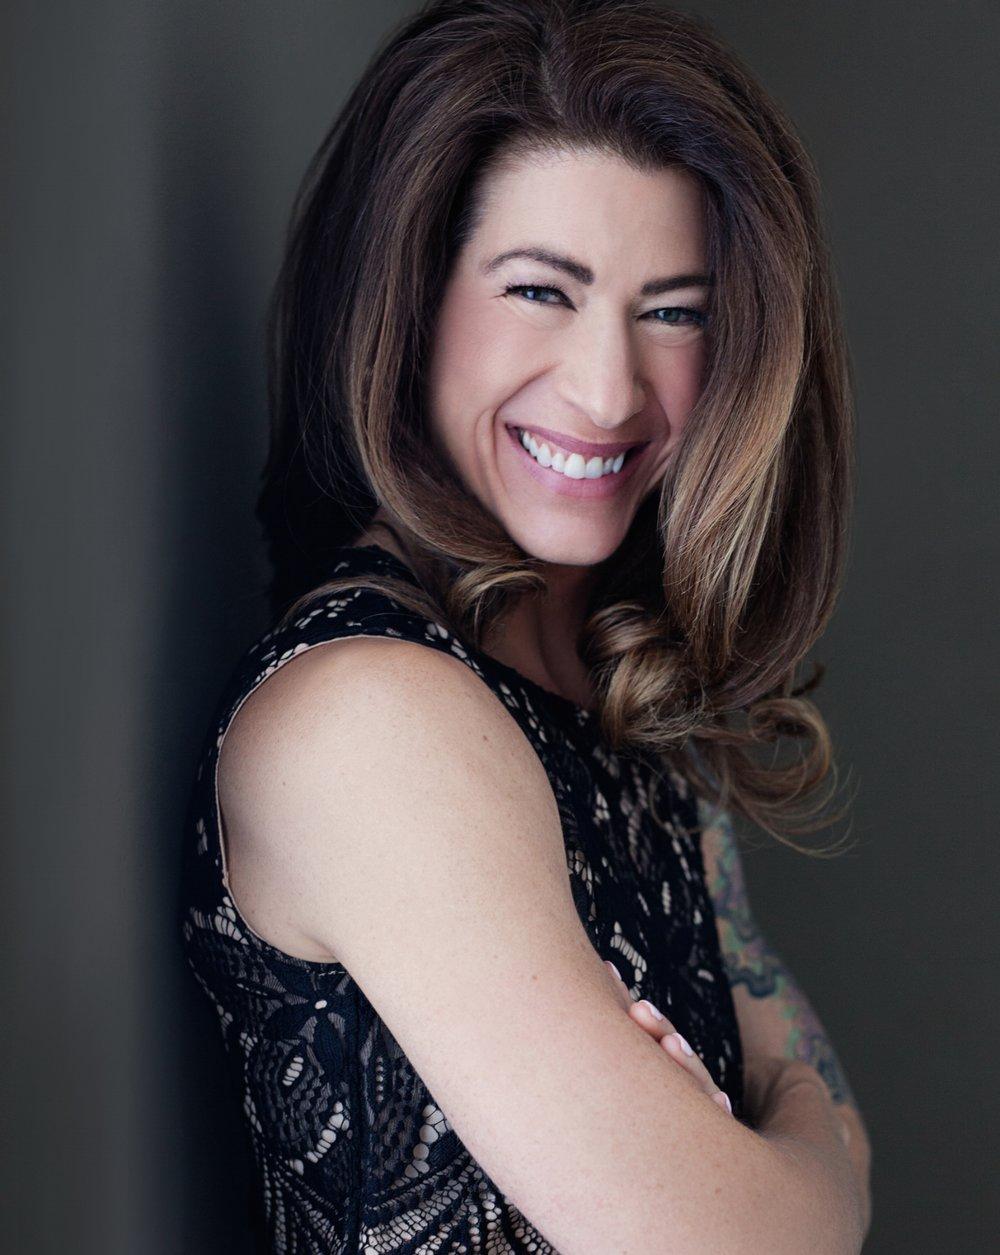 women in Business - professional - entrepreneur